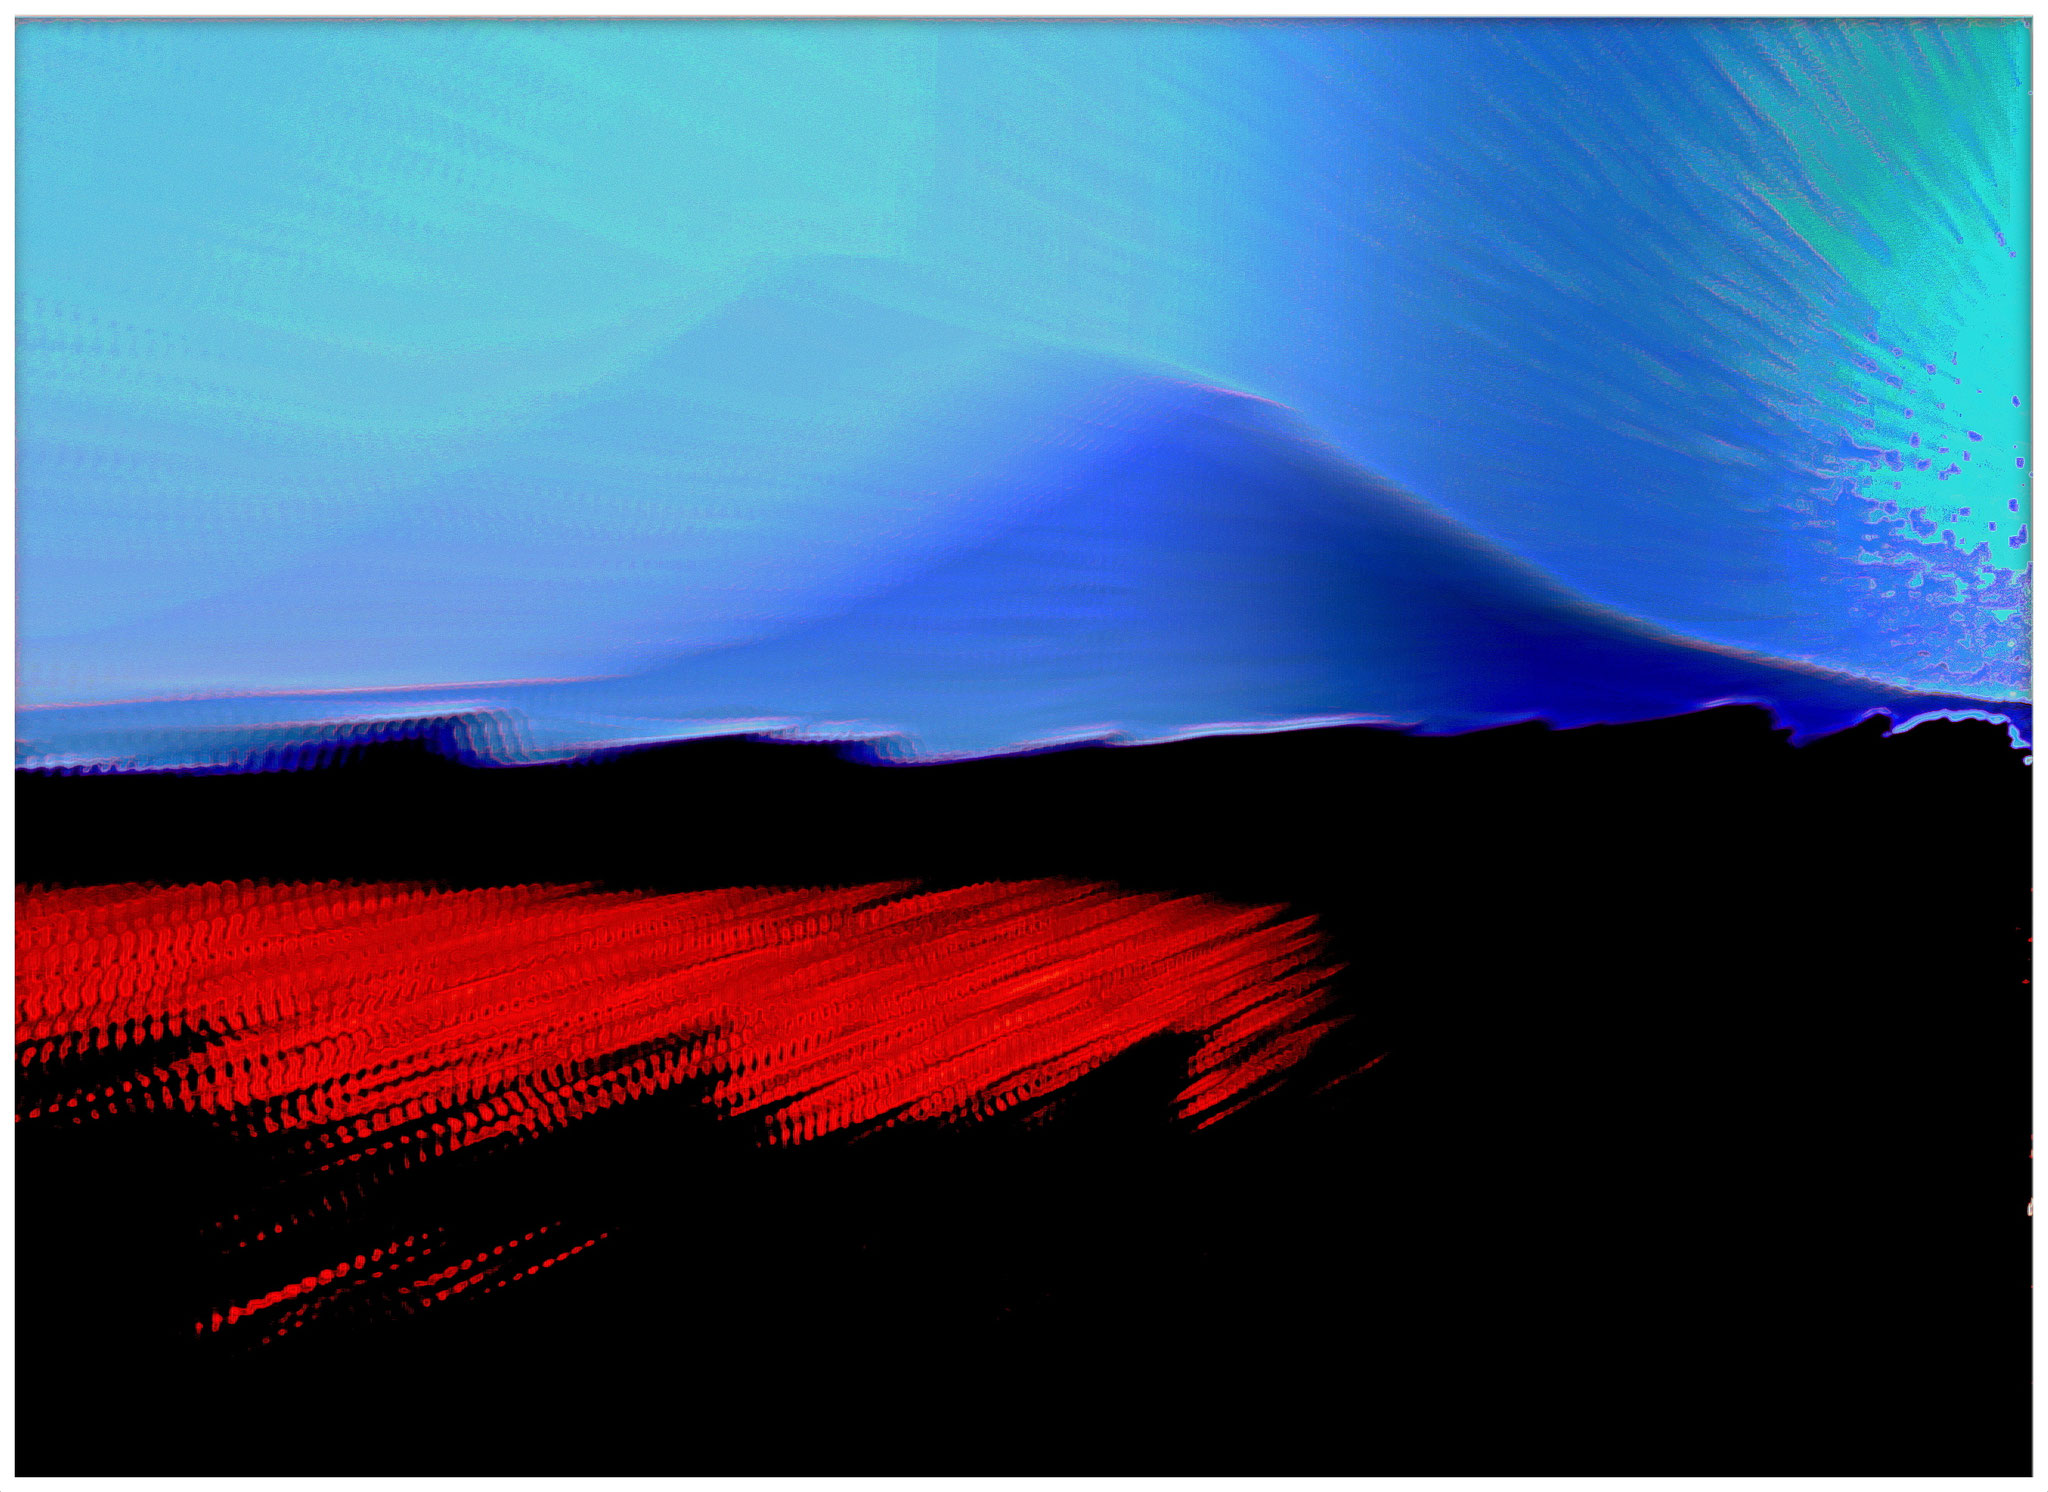 Gleich nebenan, der Vulkan - digitale Bearbeitung eines eigenen Fotos